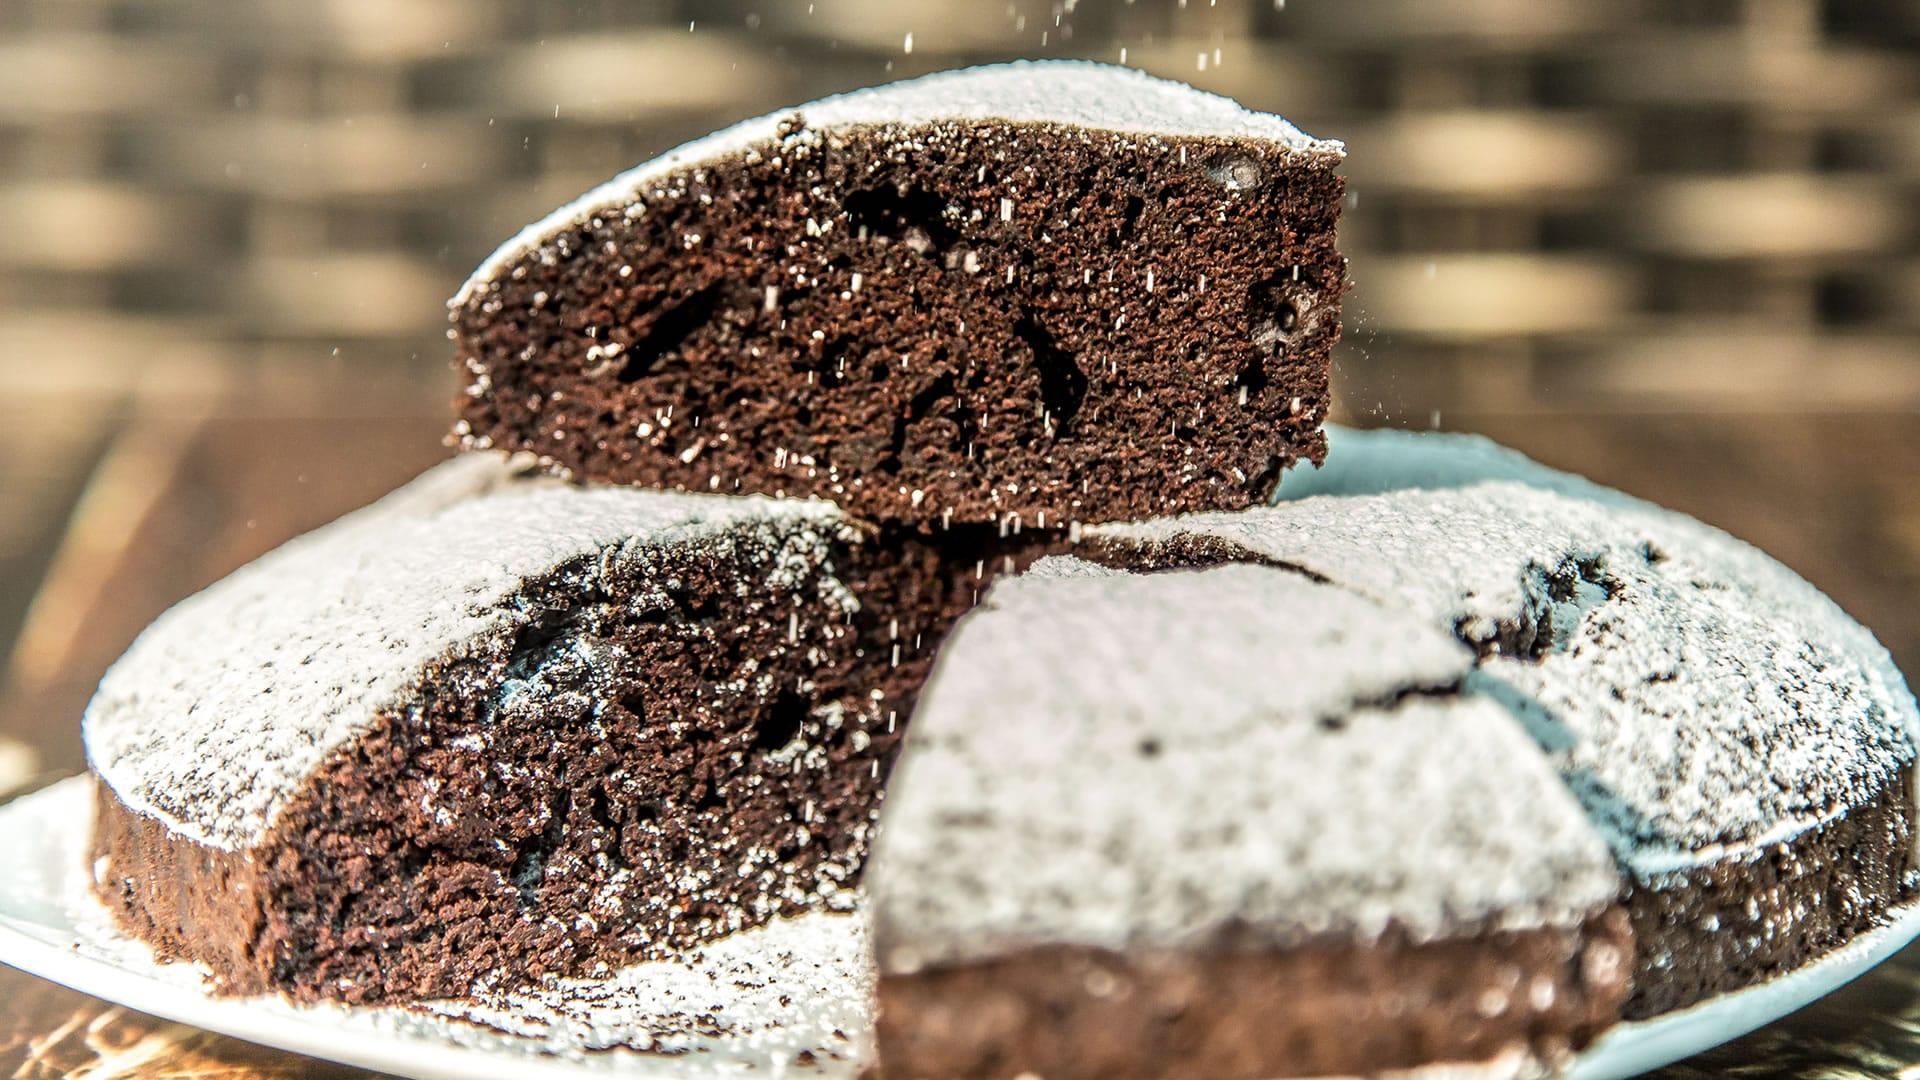 Foto Torta Matta - Crazy Cake Senza Uova, Burro, Latte, Lievito